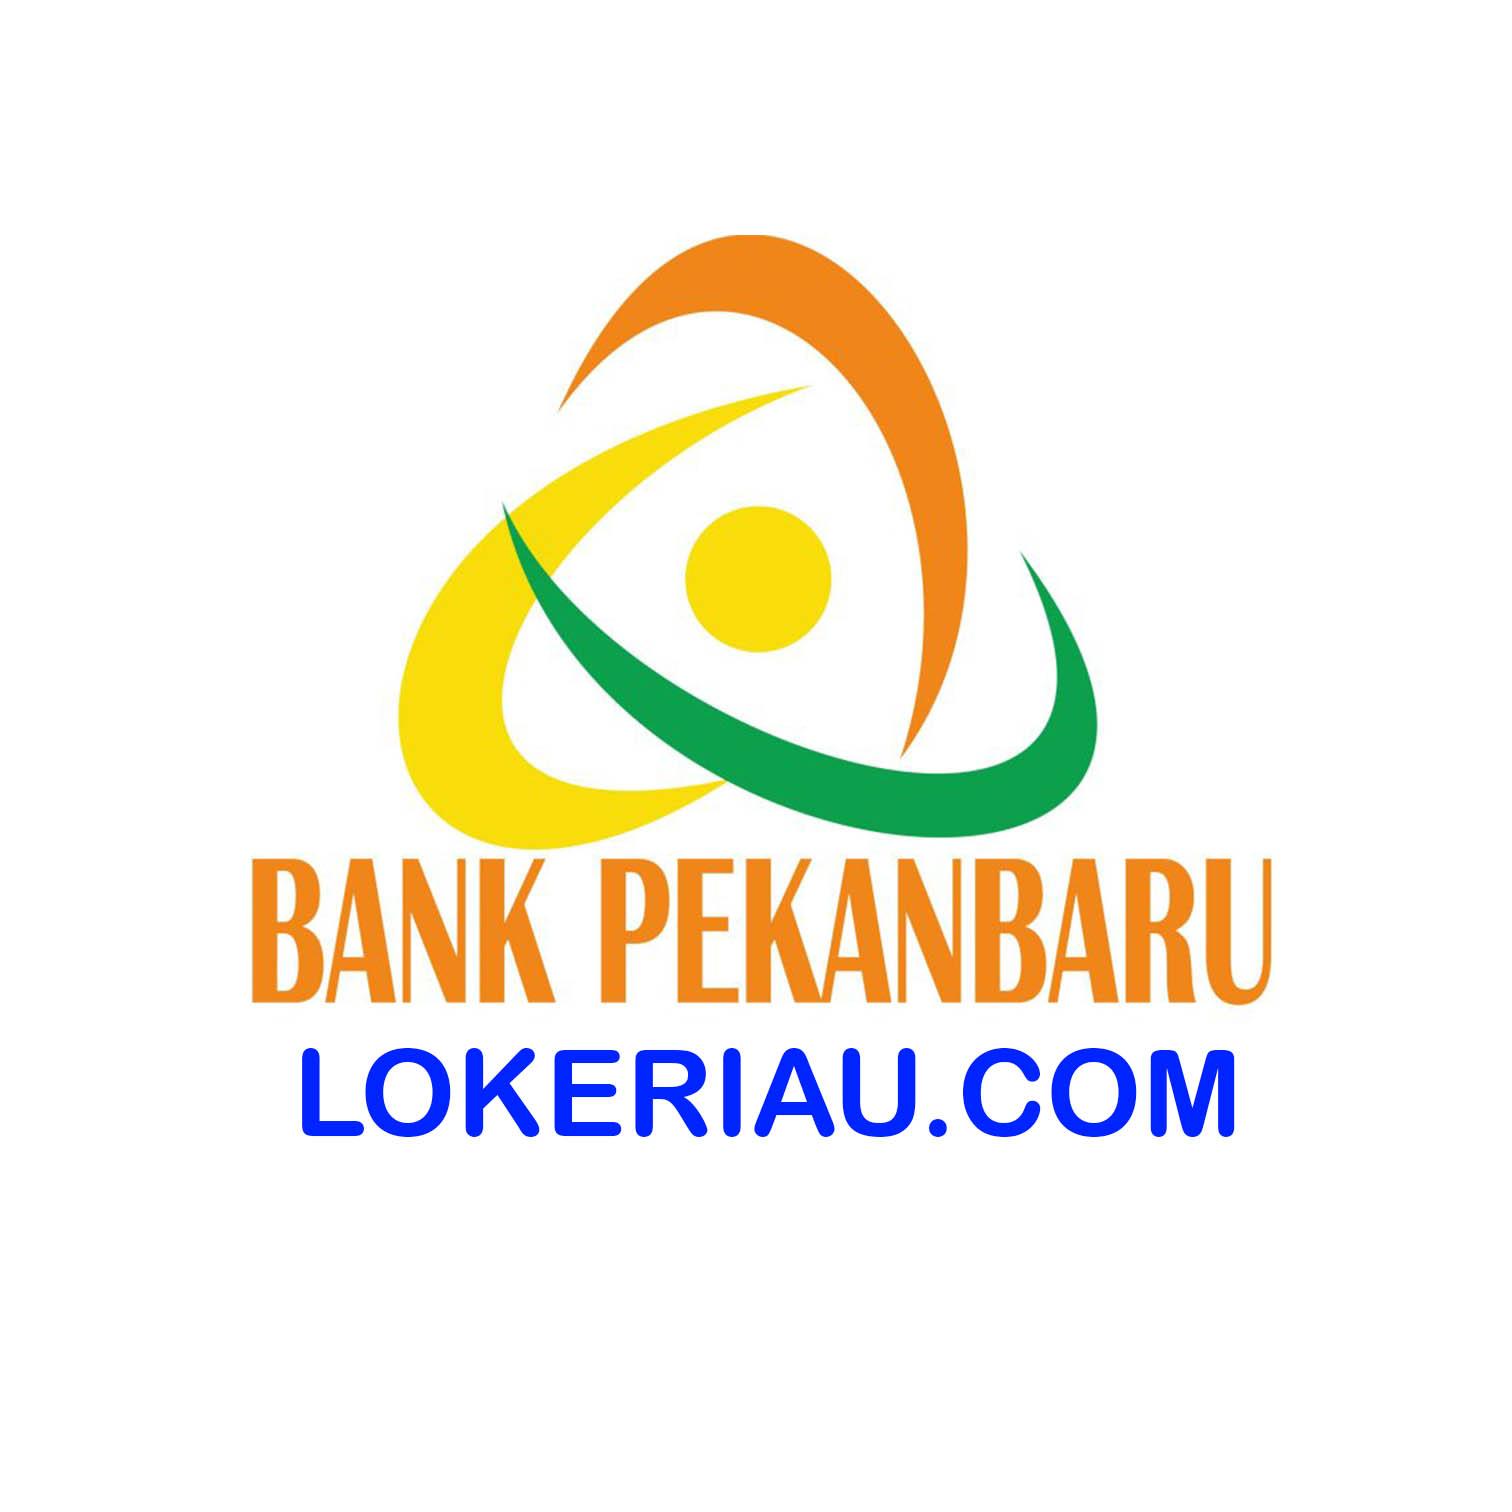 Lowongan PT Bank Perkreditan Rakyat (BPR) Pekanbaru